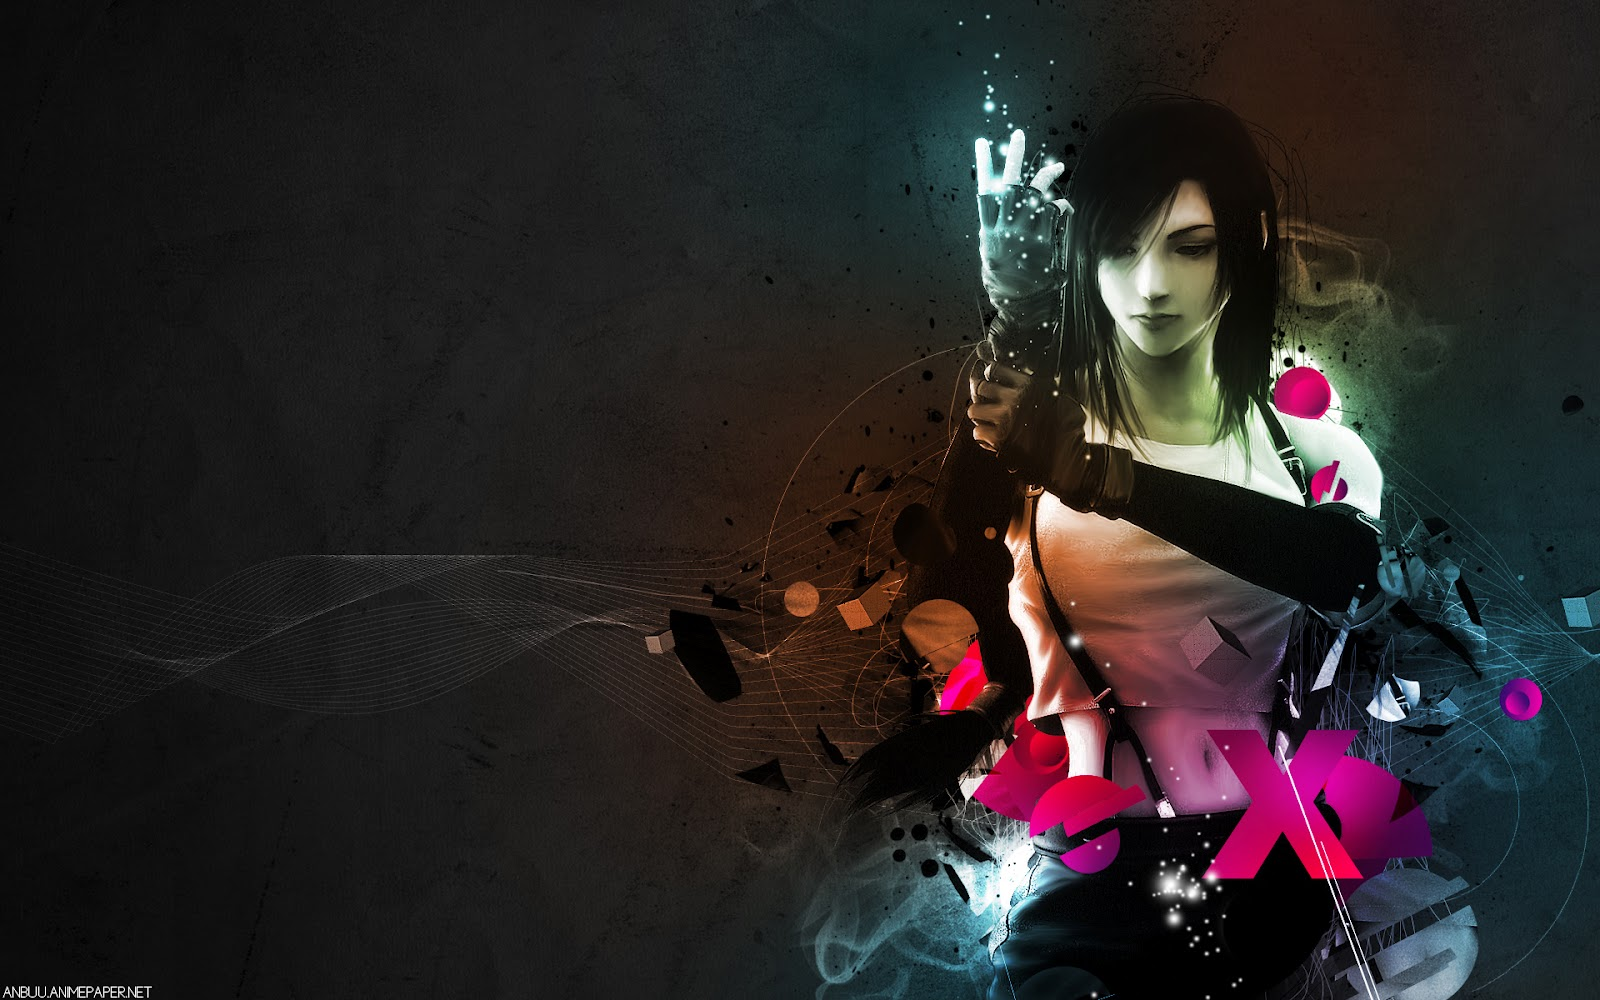 Tifa Lockhart Final Fantasy Artwork Hd Fantasy Girls 4k: Valentine Day 2014: Tifa Lockheart Hd Wallpaper